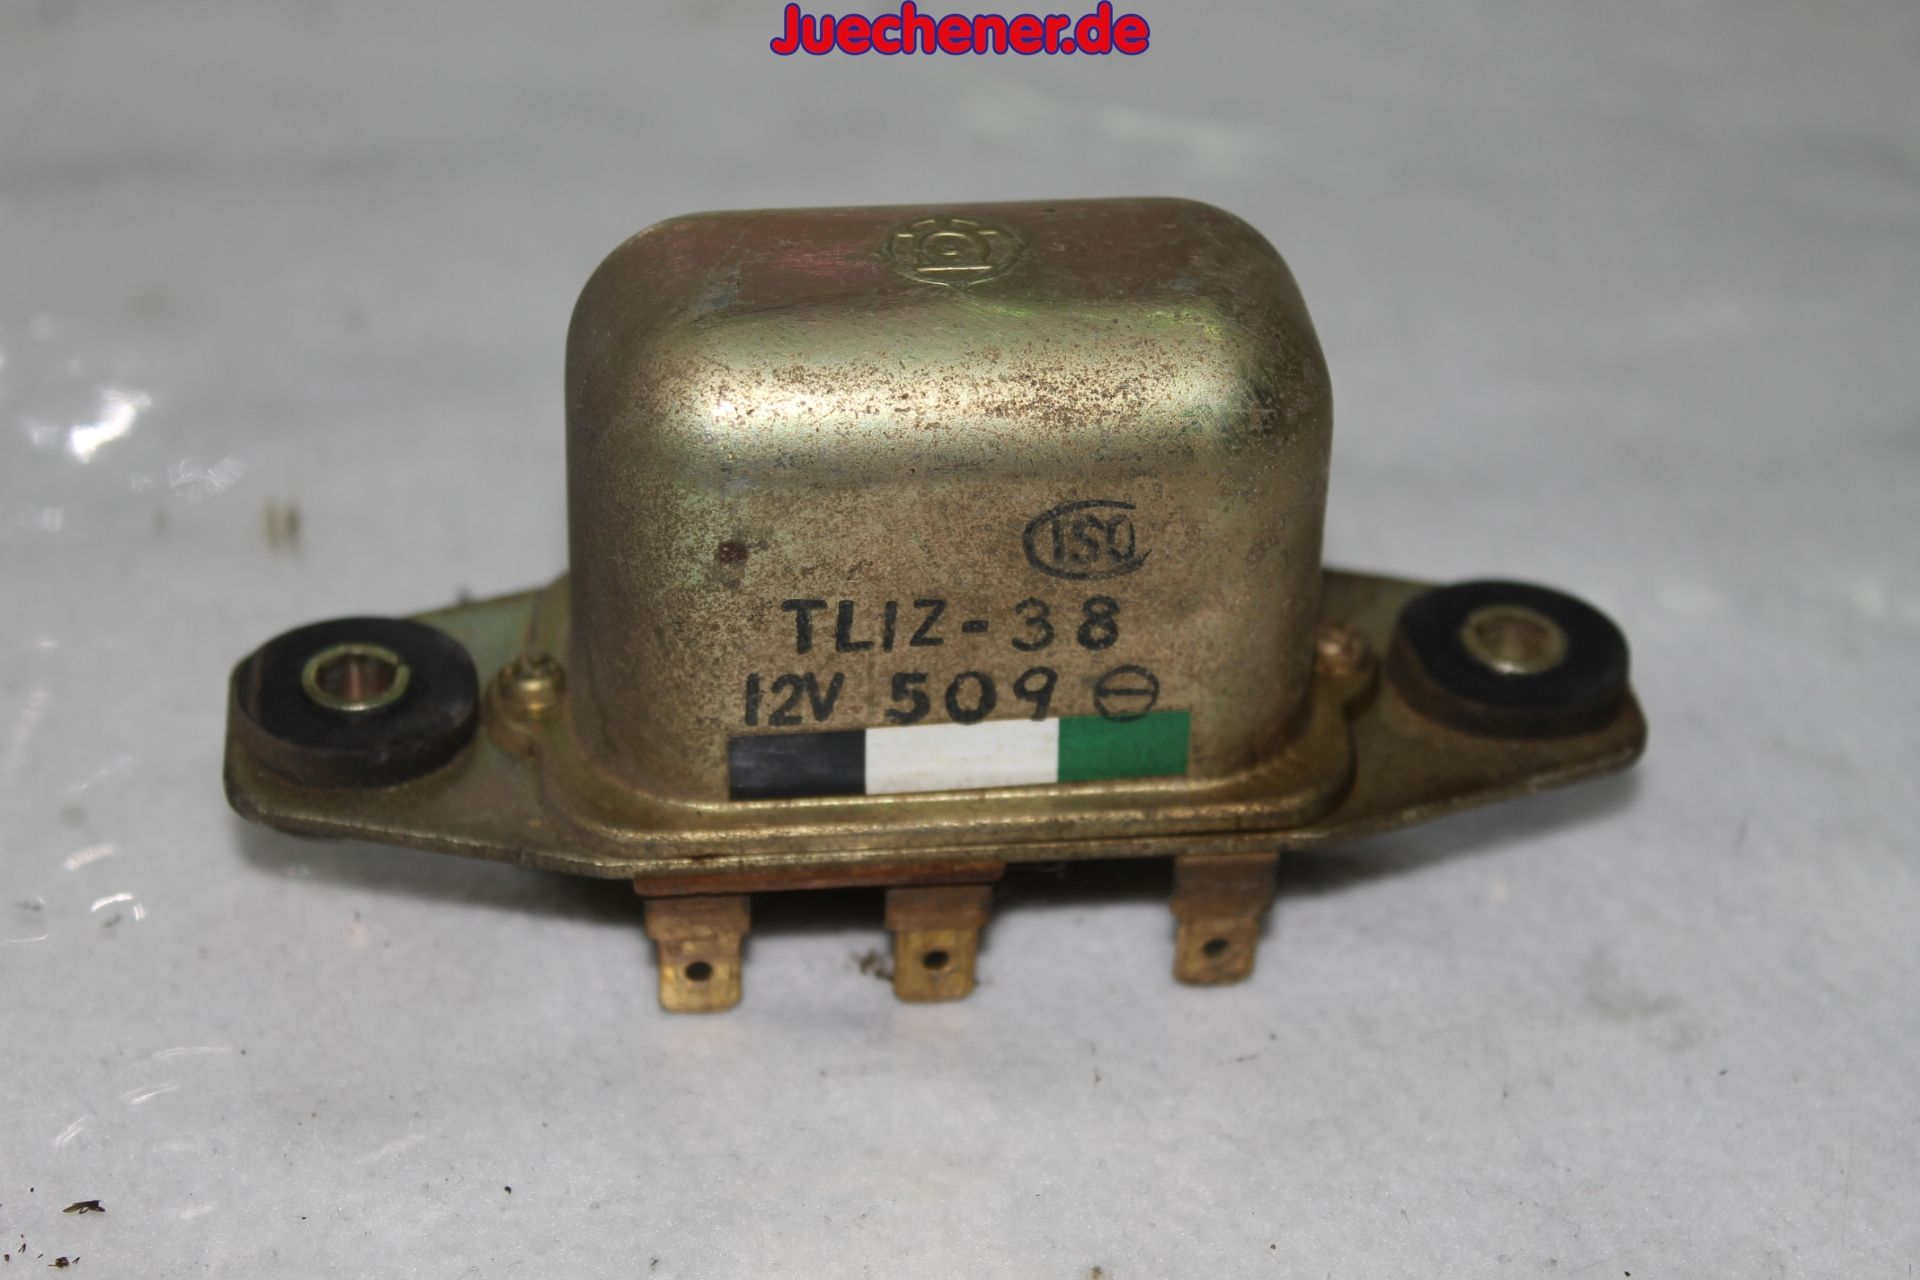 Honda CB750F Baujahr 1976 Regler Spannungsregler Low tension regulator  #lowtensionregulator #Regler #Spannungsregler Check more at https://juechener.de/shop/ersatzteile-gebraucht/honda/cb-750/elektrik-zuendanlage-cb-750/honda-cb750f-baujahr-1976-regler-spannungsregler-low-tension-regulator/